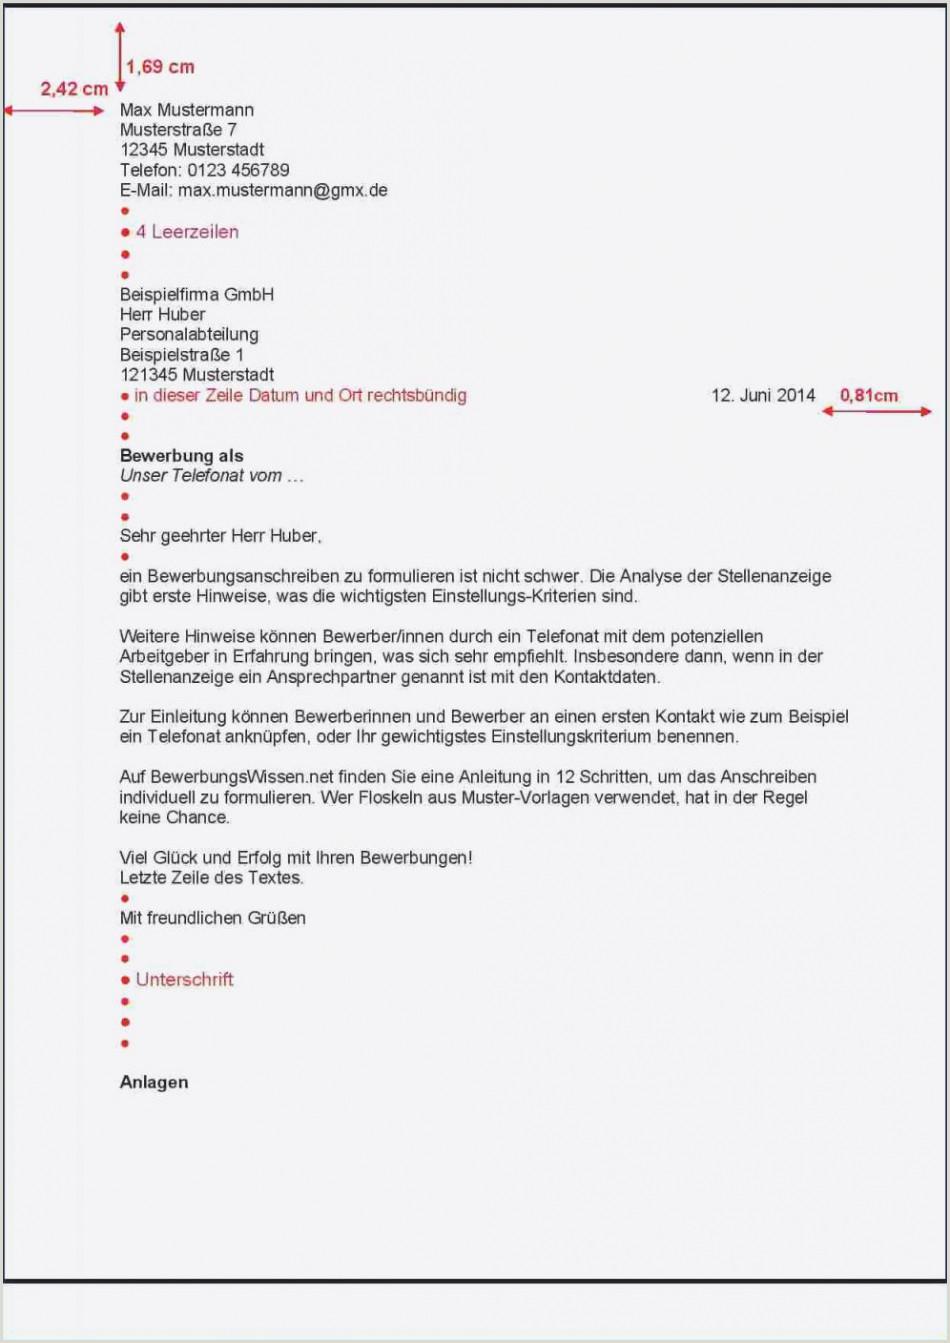 Lebenslauf Muster Schüler Fsj   myoscommercetemplates.com